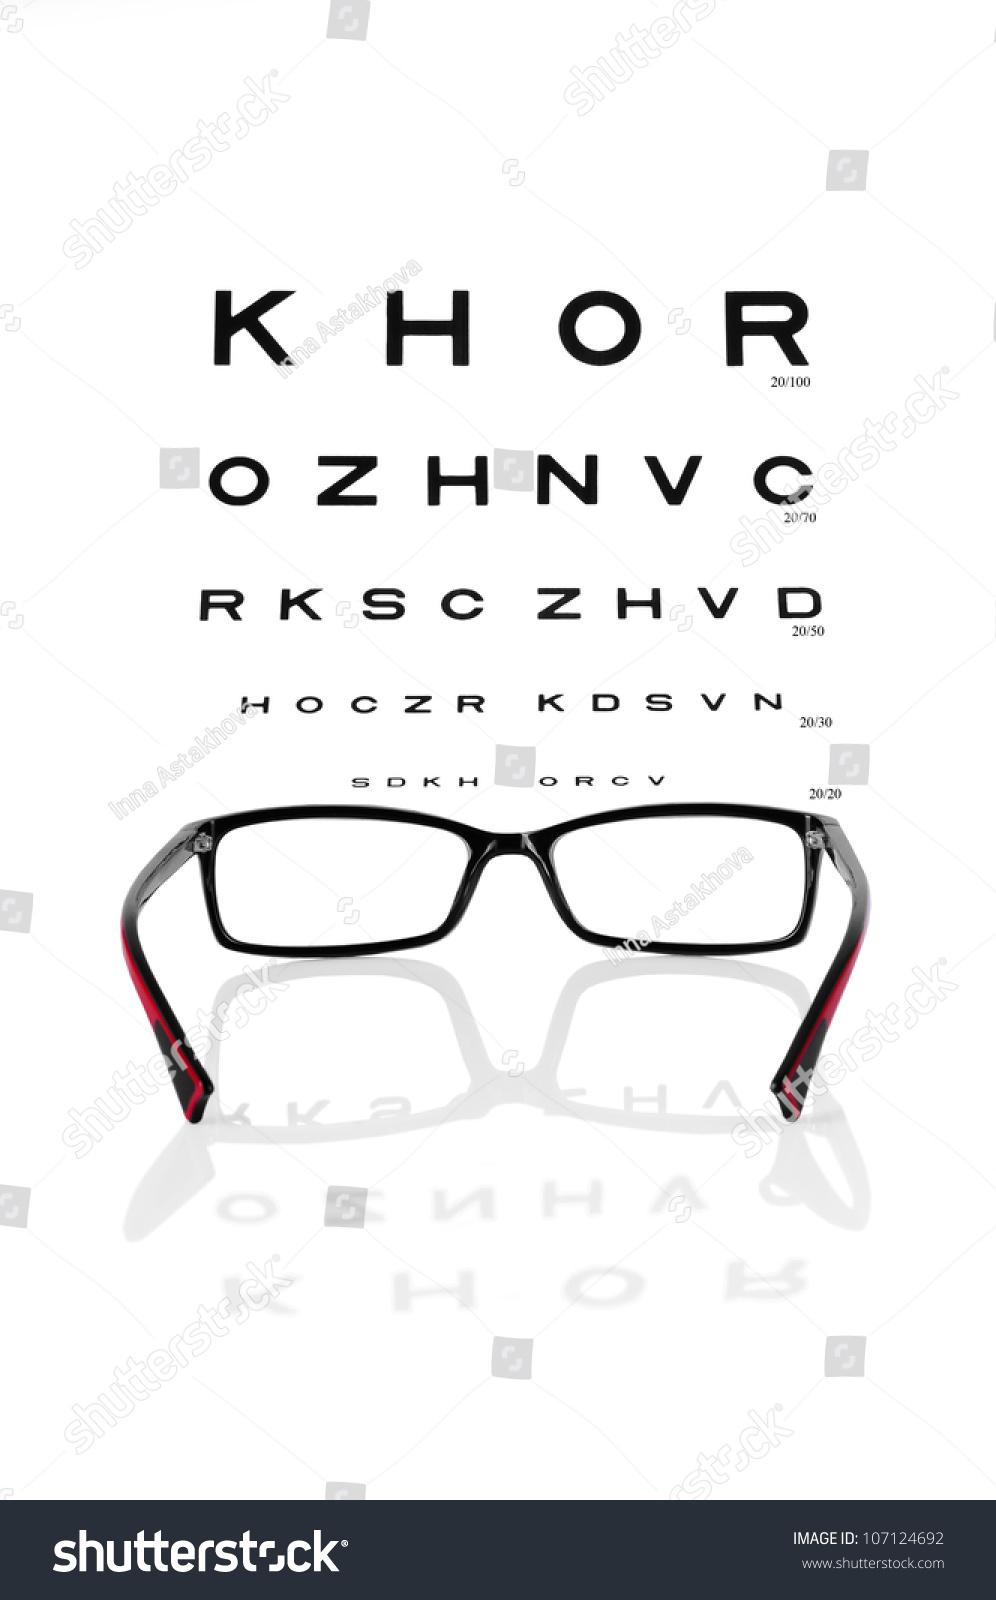 Reading eyeglasses eye chart stock photo 107124692 shutterstock reading eyeglasses and eye chart nvjuhfo Image collections